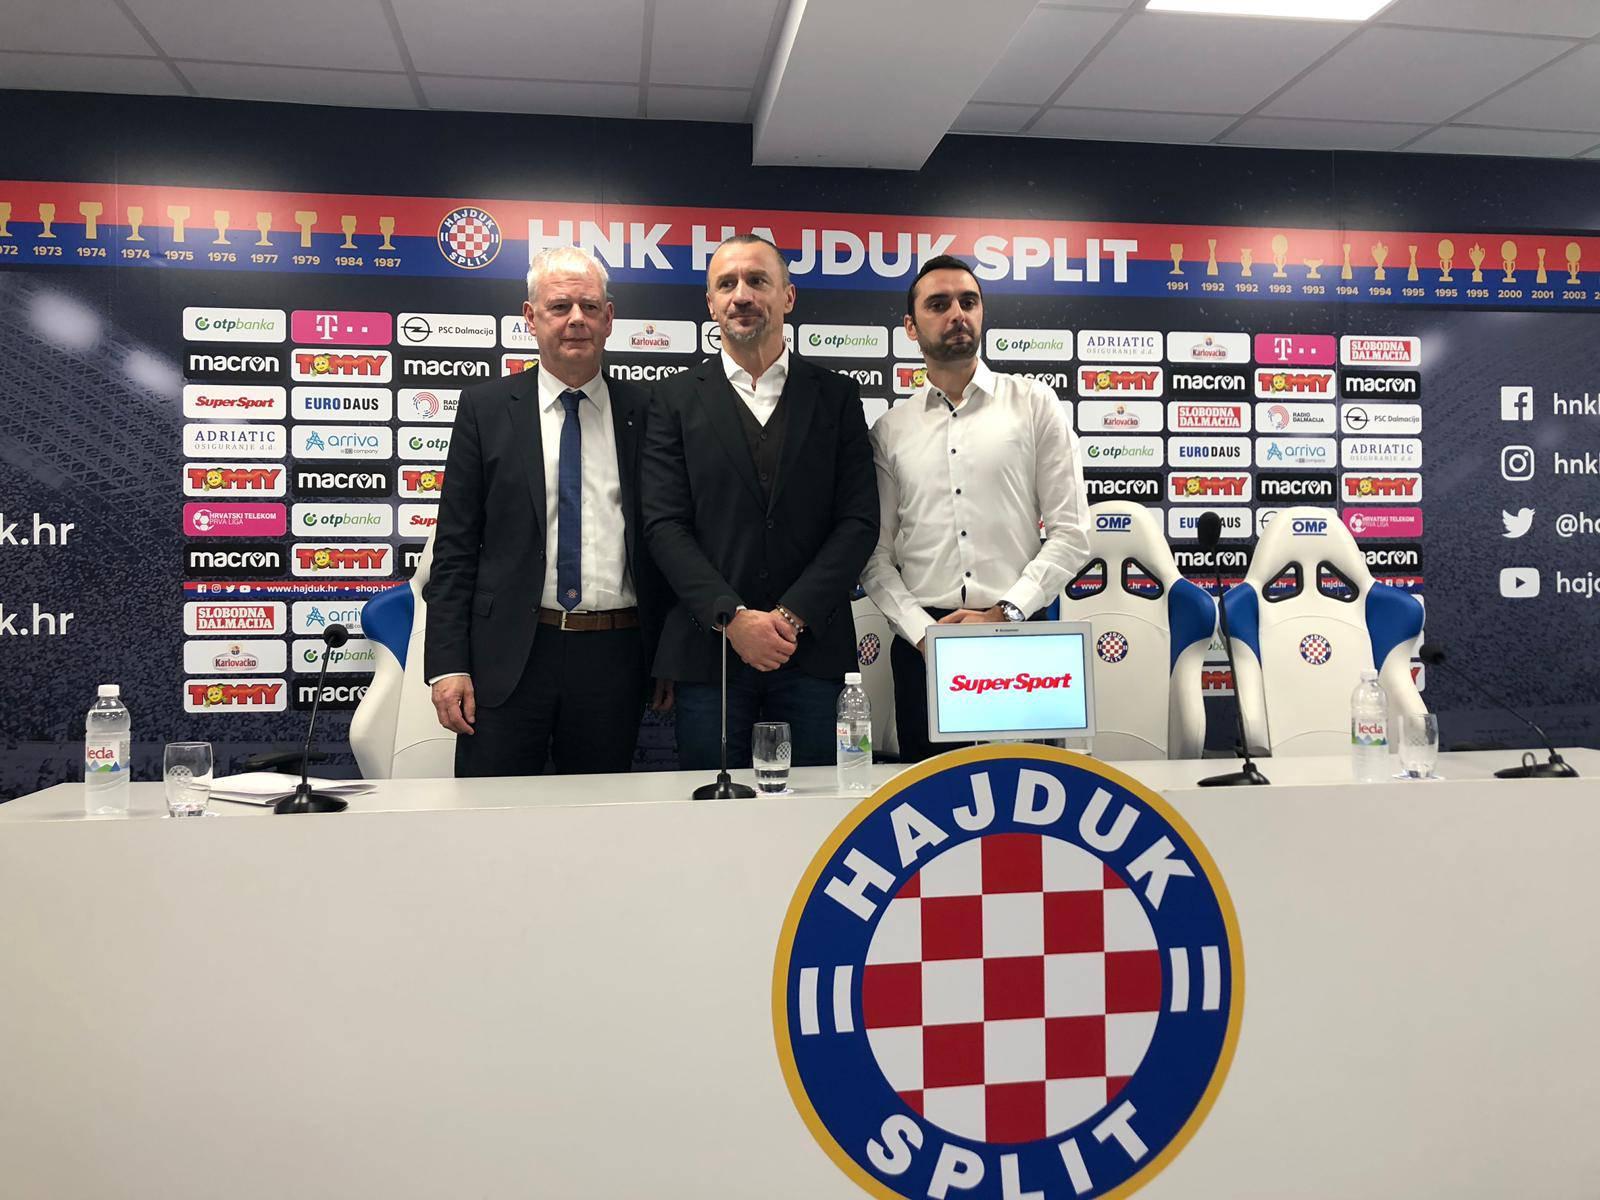 Da je Hajduk trenere birao na lutriji, rezultati ne bi bili gori